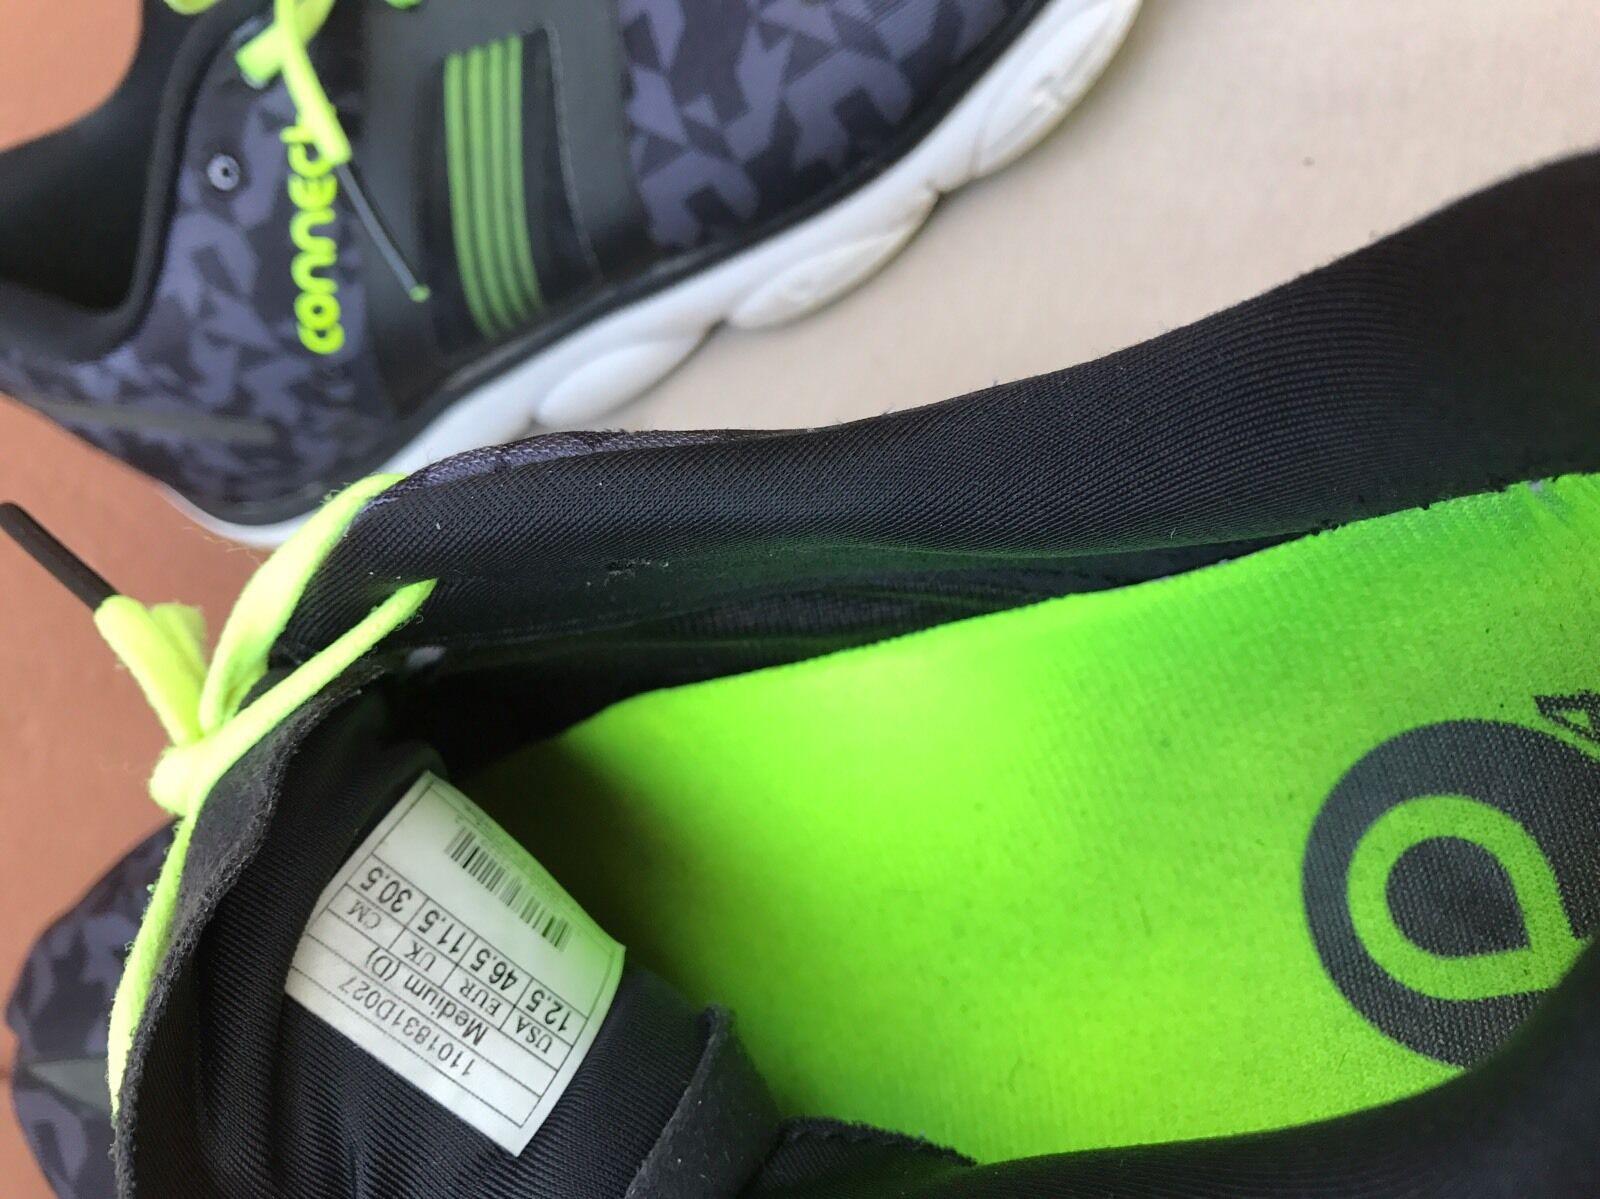 EUC Brooks Pure Connect 4 Uomo 12.5 SneakerS US 12.5 Uomo Nero Green White Tennis Shoes 2d7680